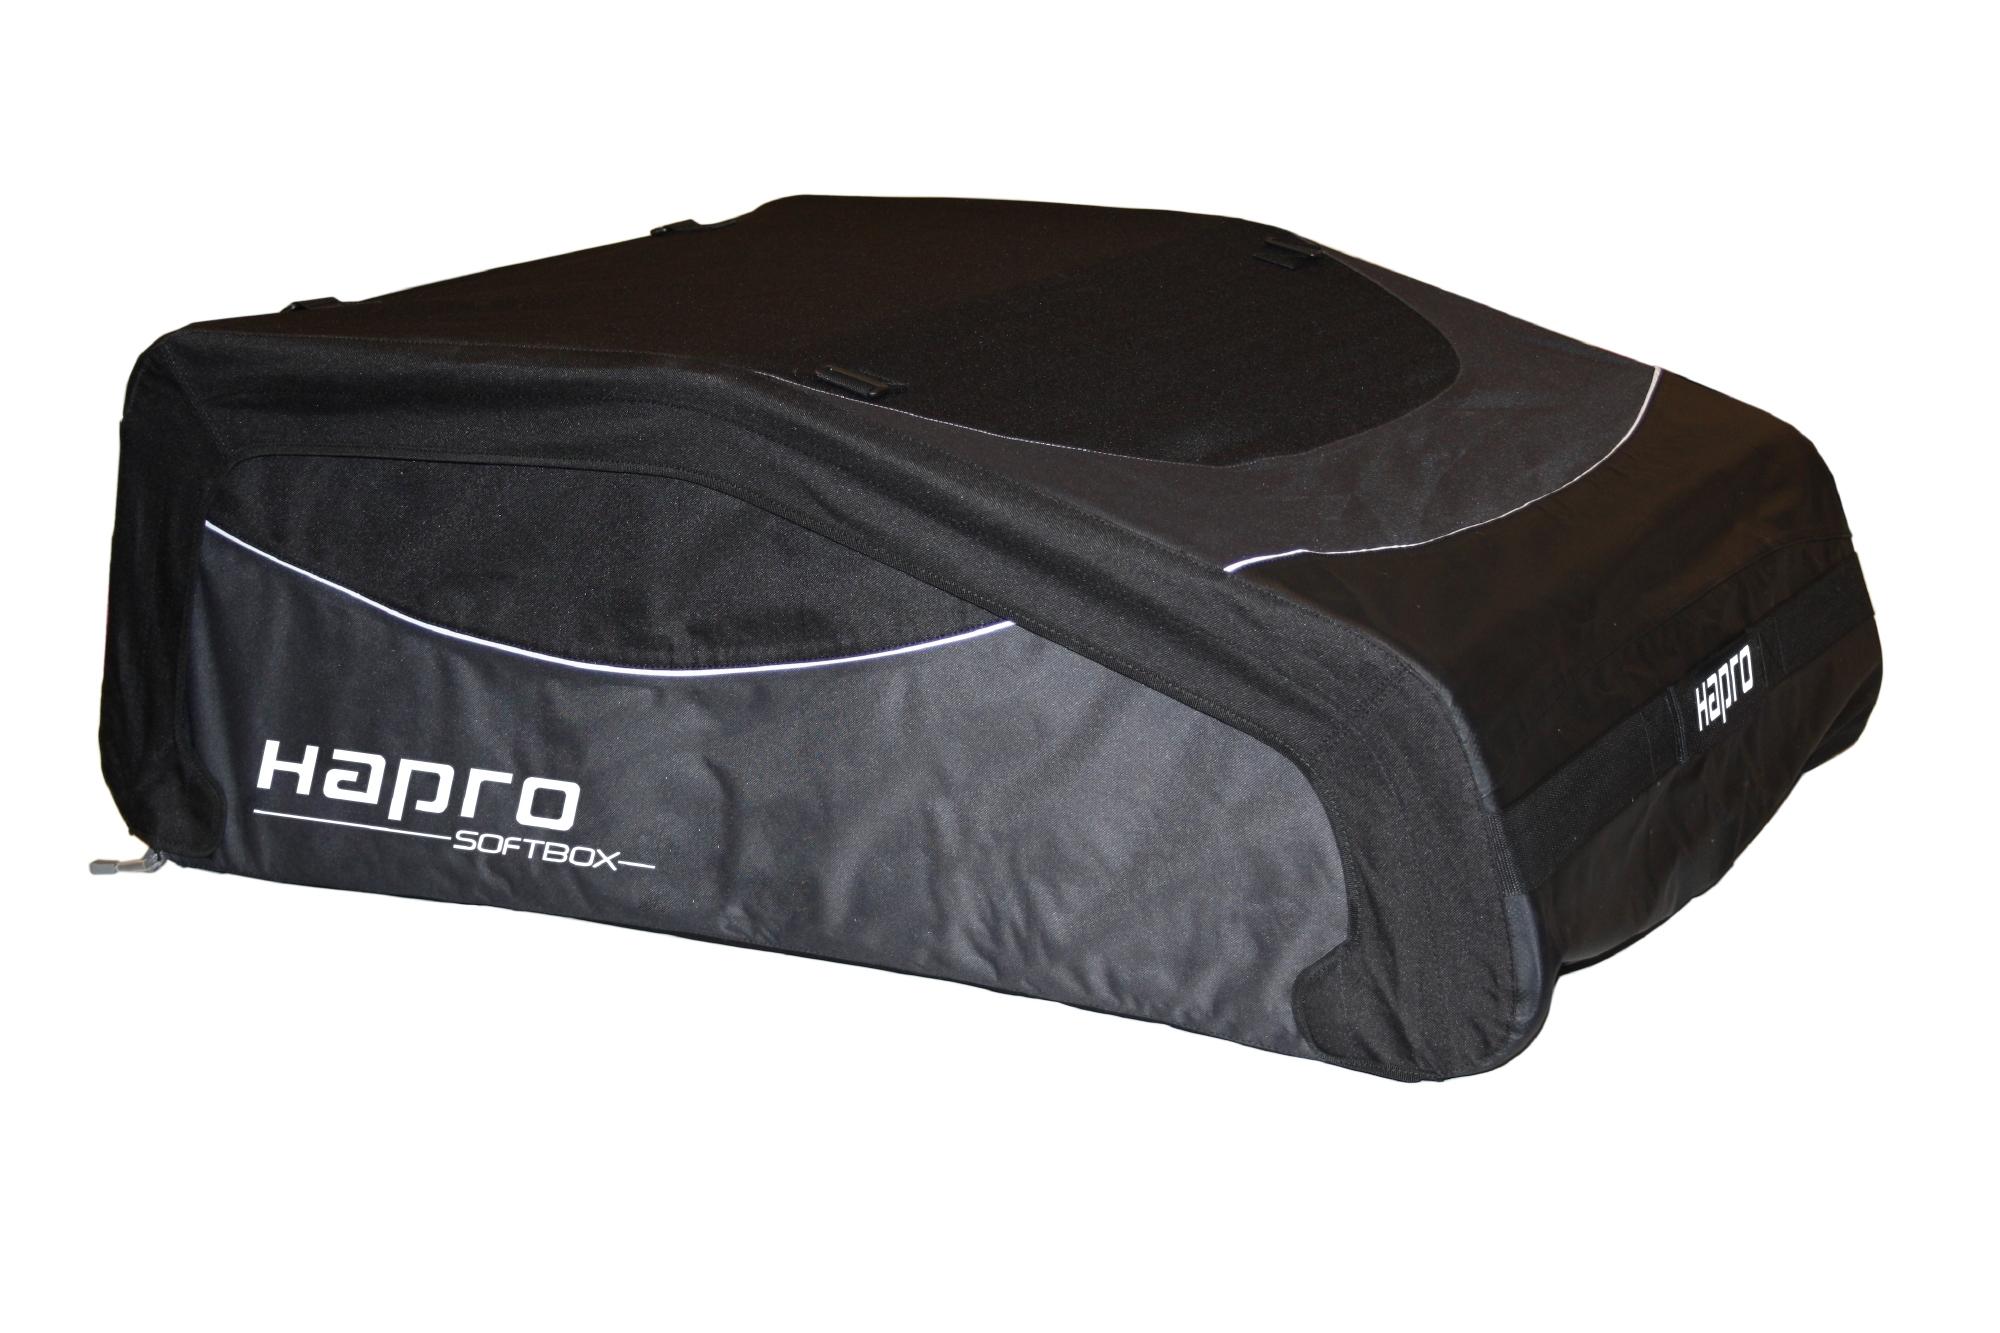 Hapro Softbox 375L